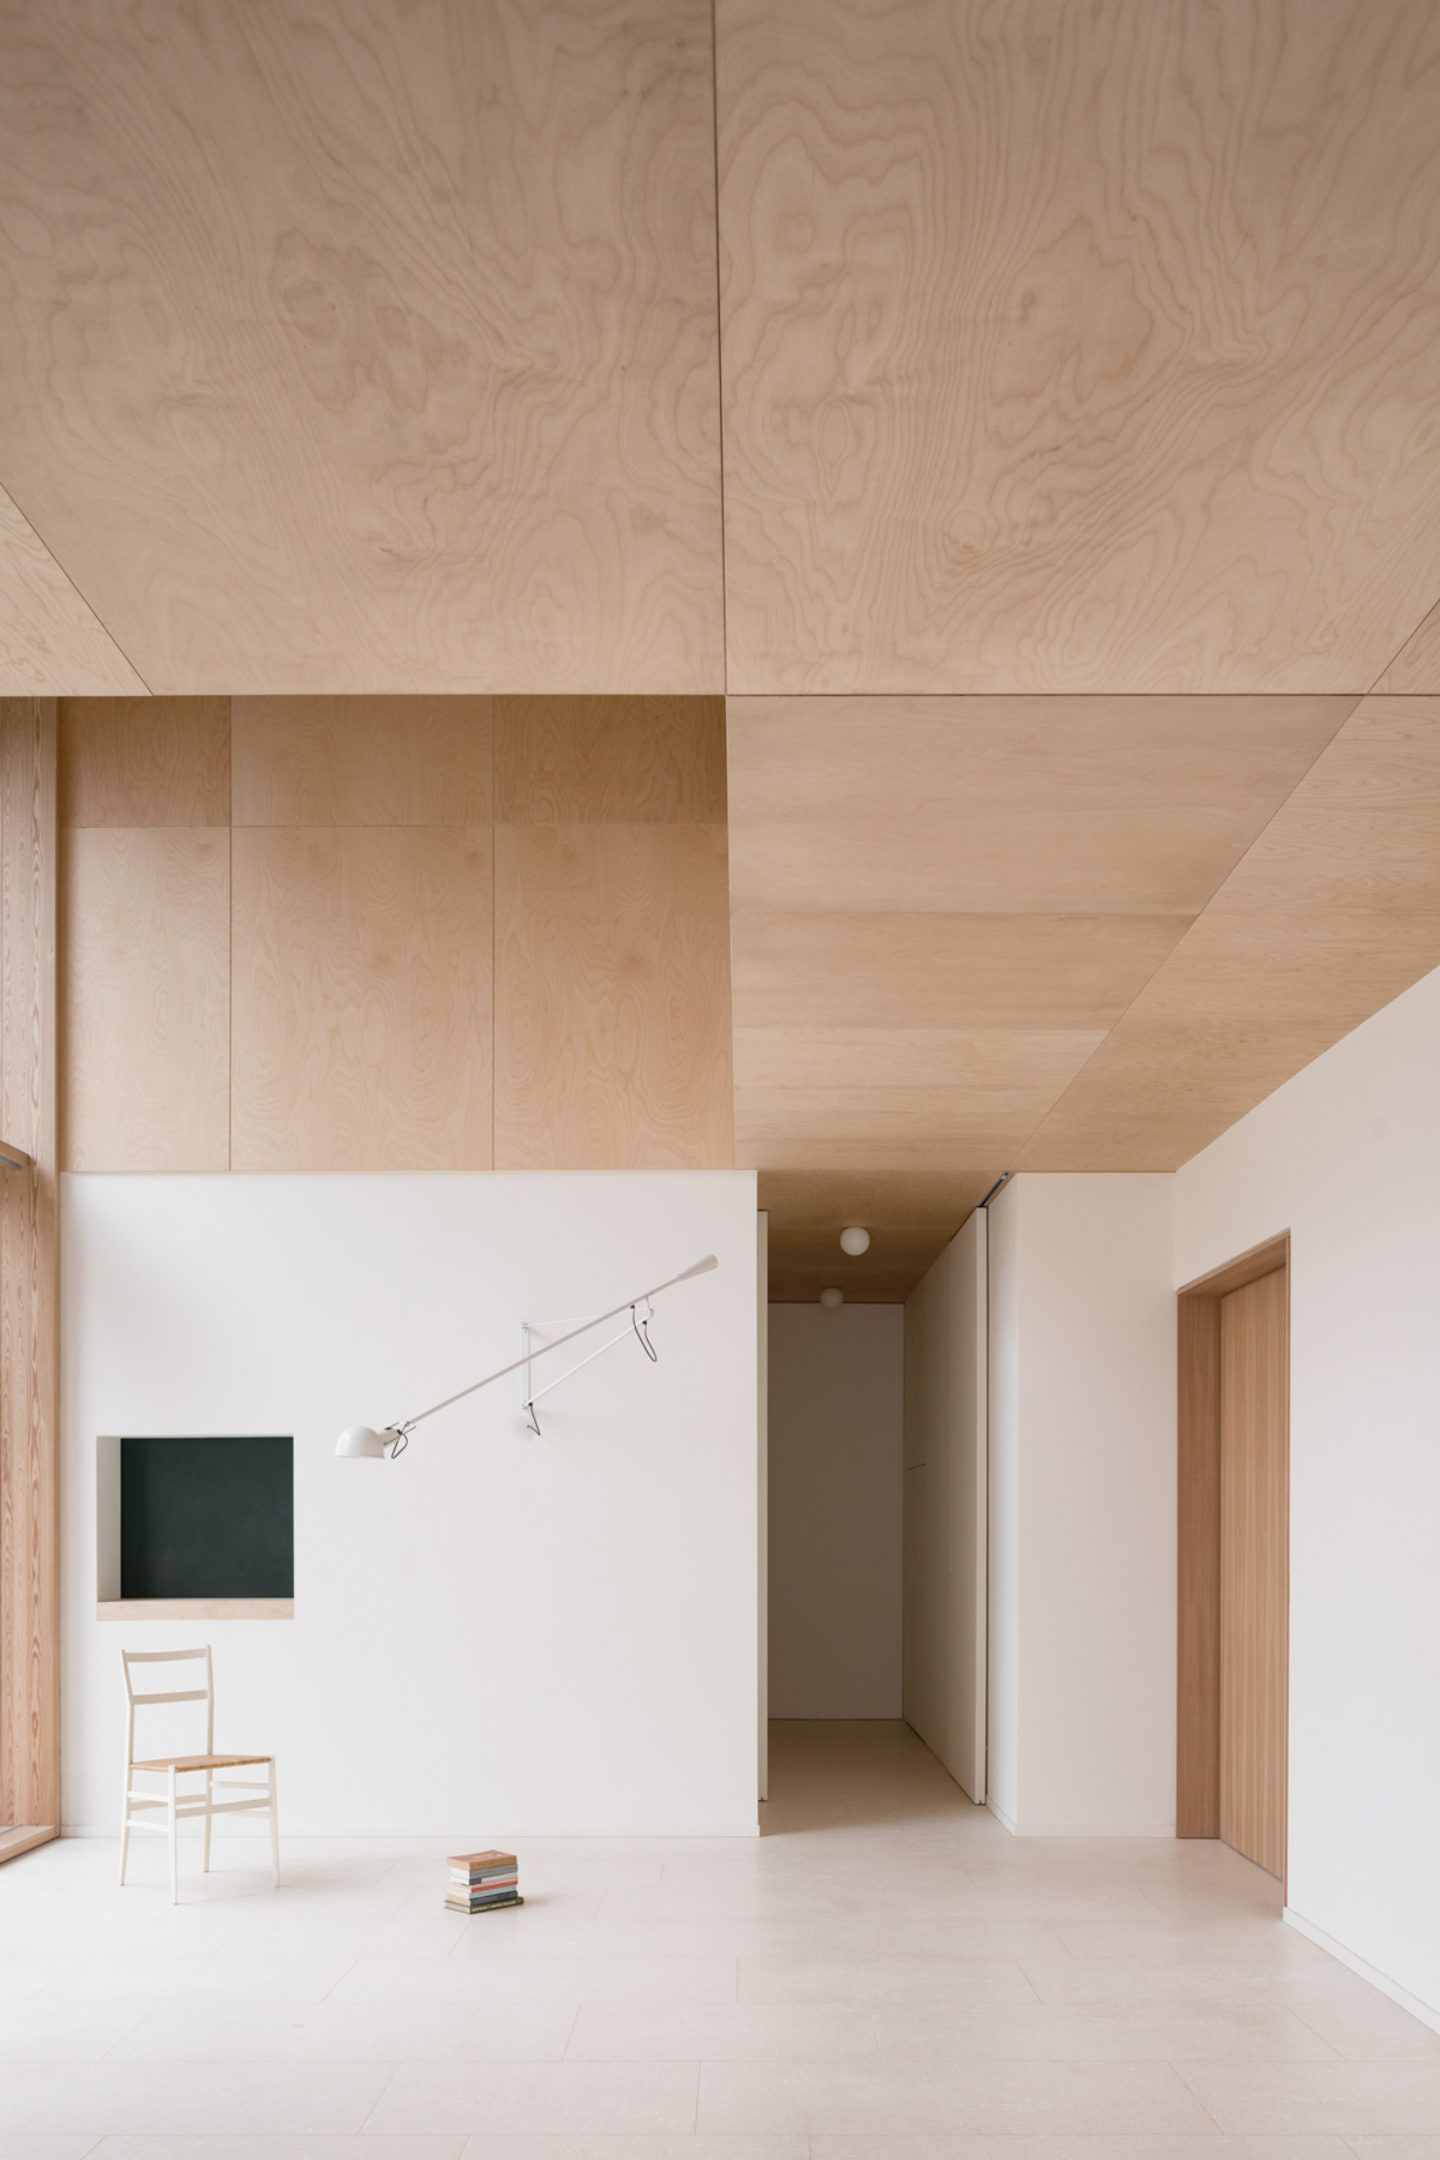 IGNANT-Architecture-Studio-Wok-Country-Home-In-Chievo-11